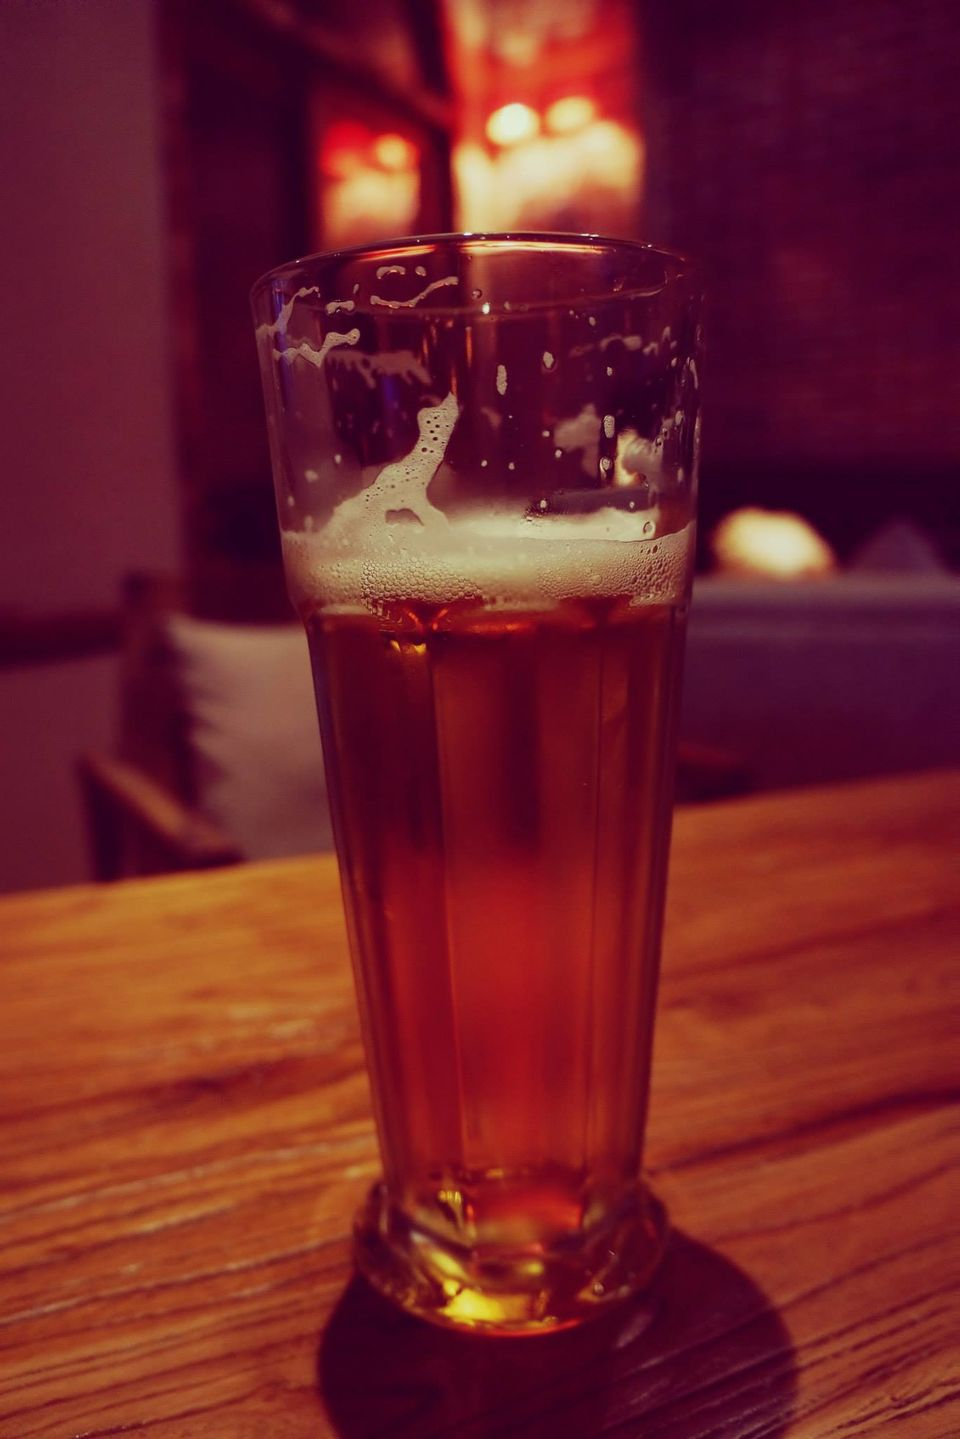 Beer Tour of North Korea - Tripoto